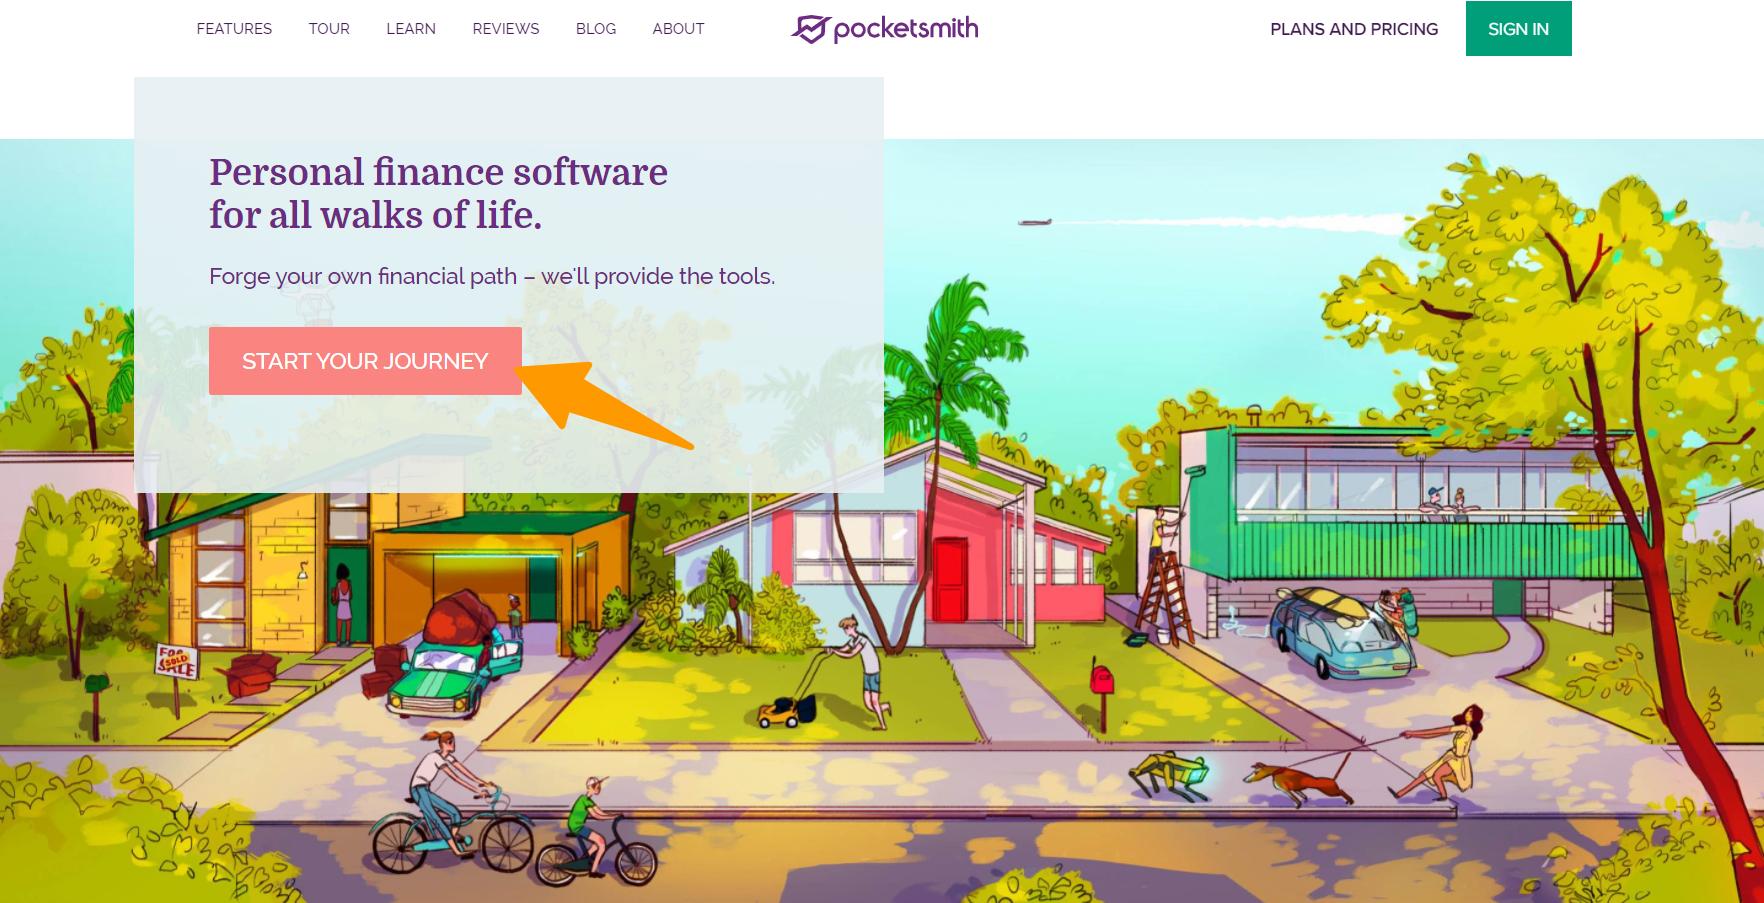 PocketSmith- Overview